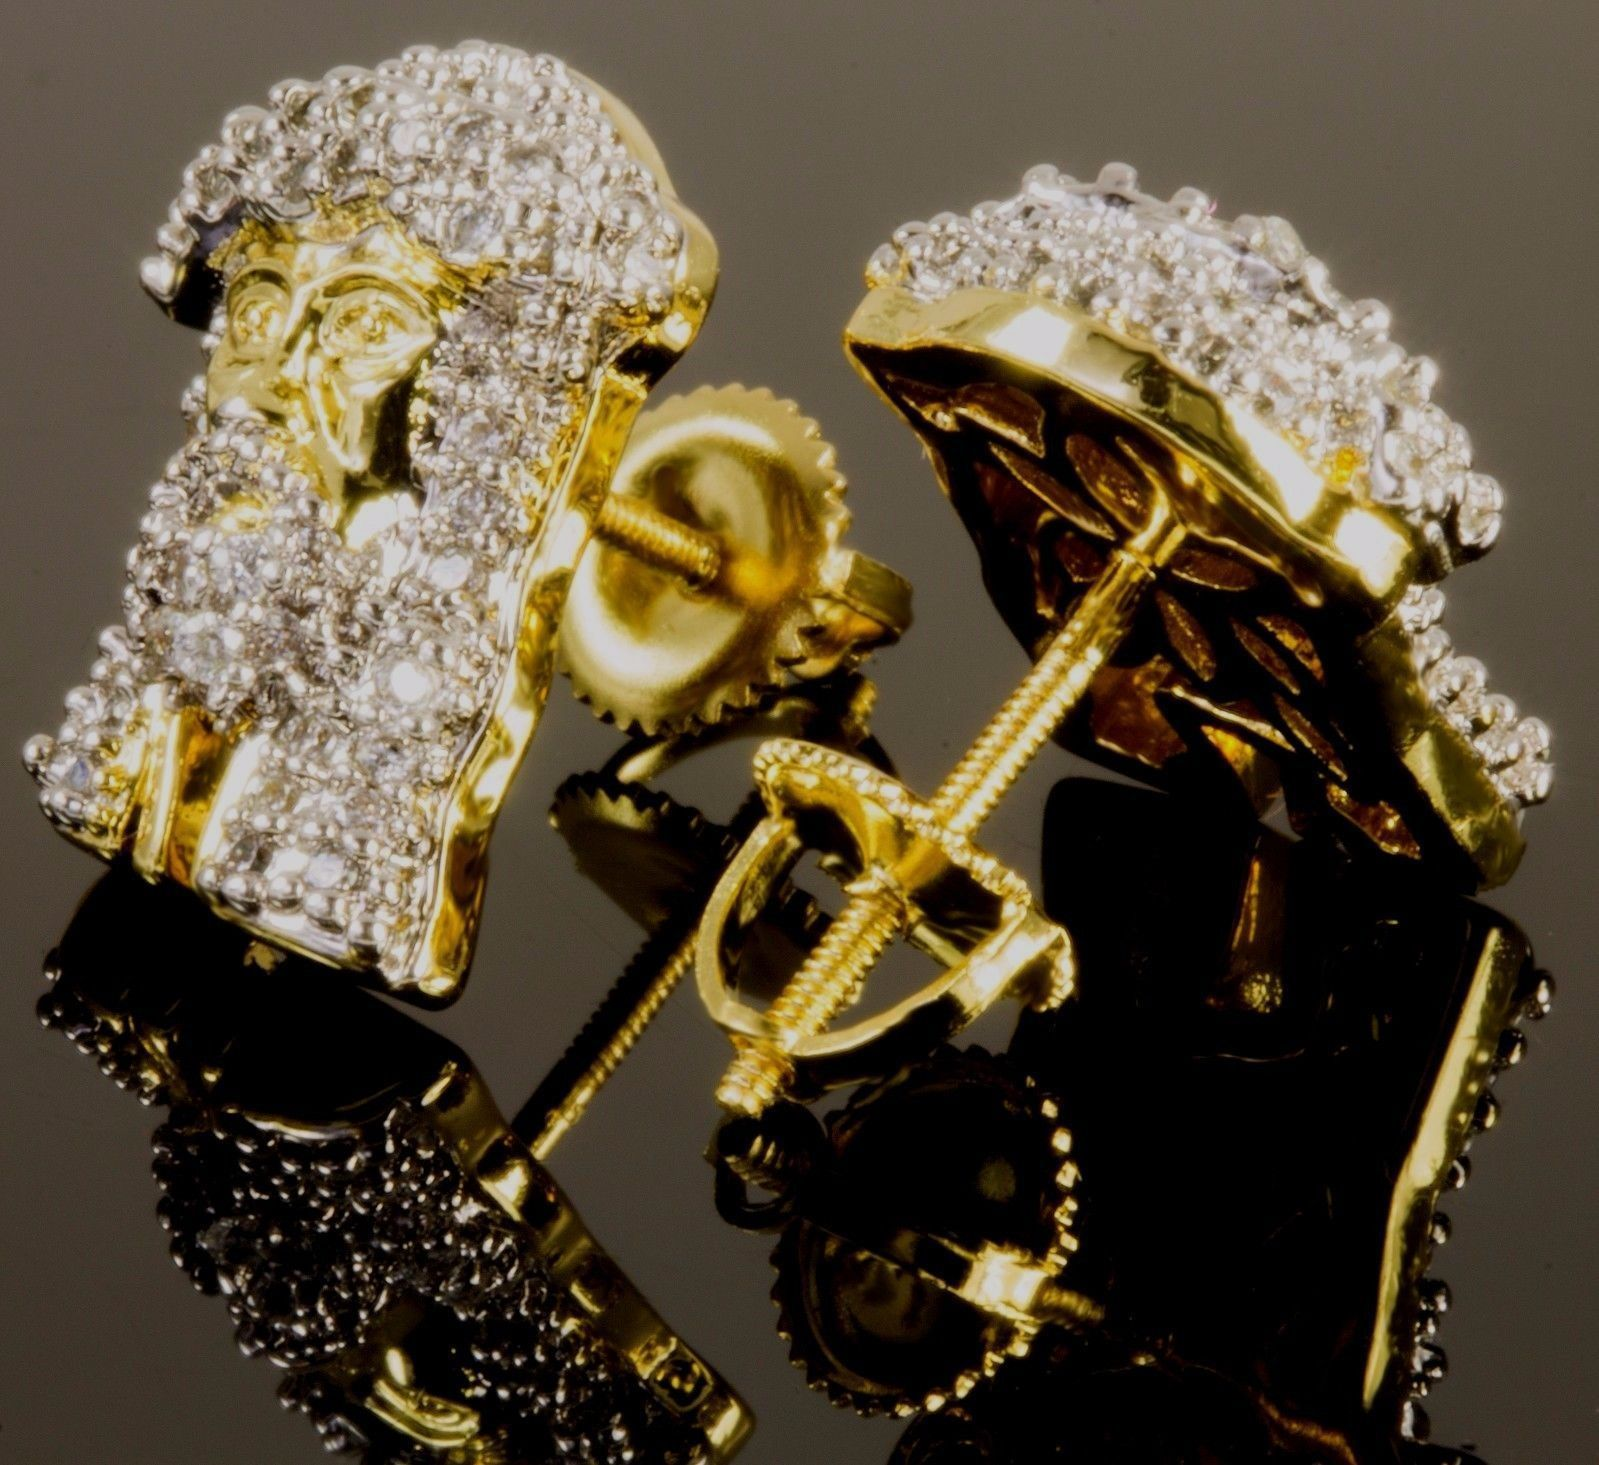 14k-Yellow-Gold-Fn-Twoo-Tone-Jesus-Face-Head-Stud-Earring With Sim Diamond